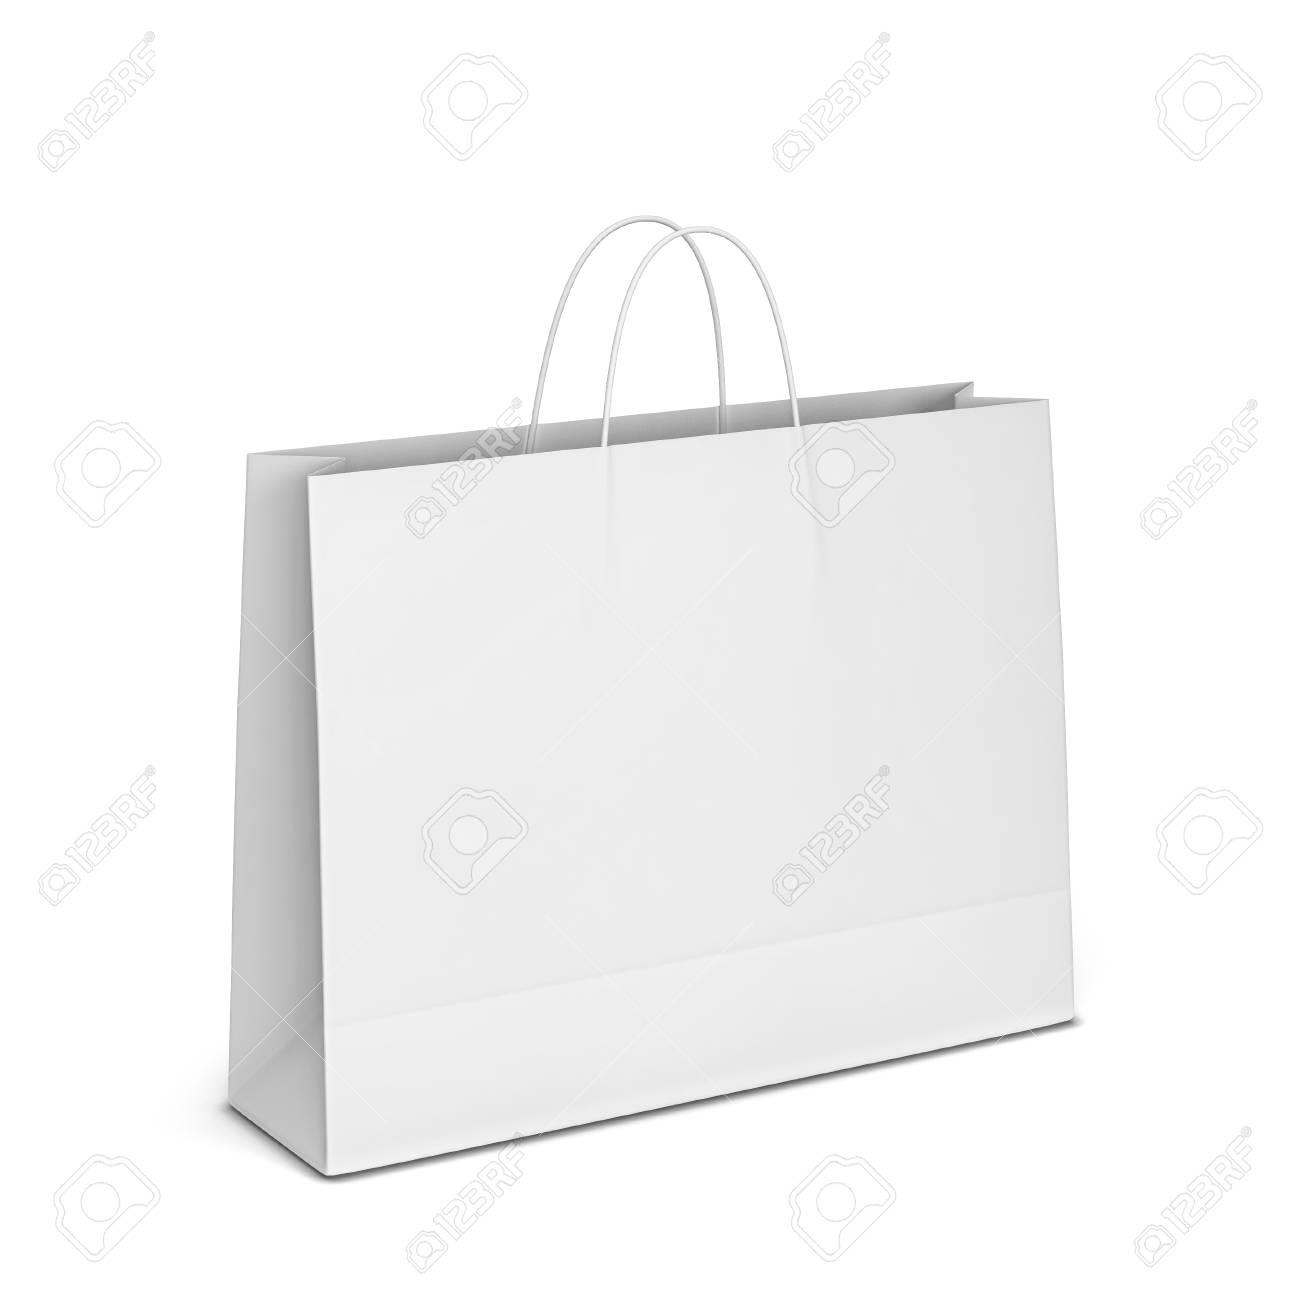 Blank shopping bag mockup. 3d illustration isolated on white background - 107343061